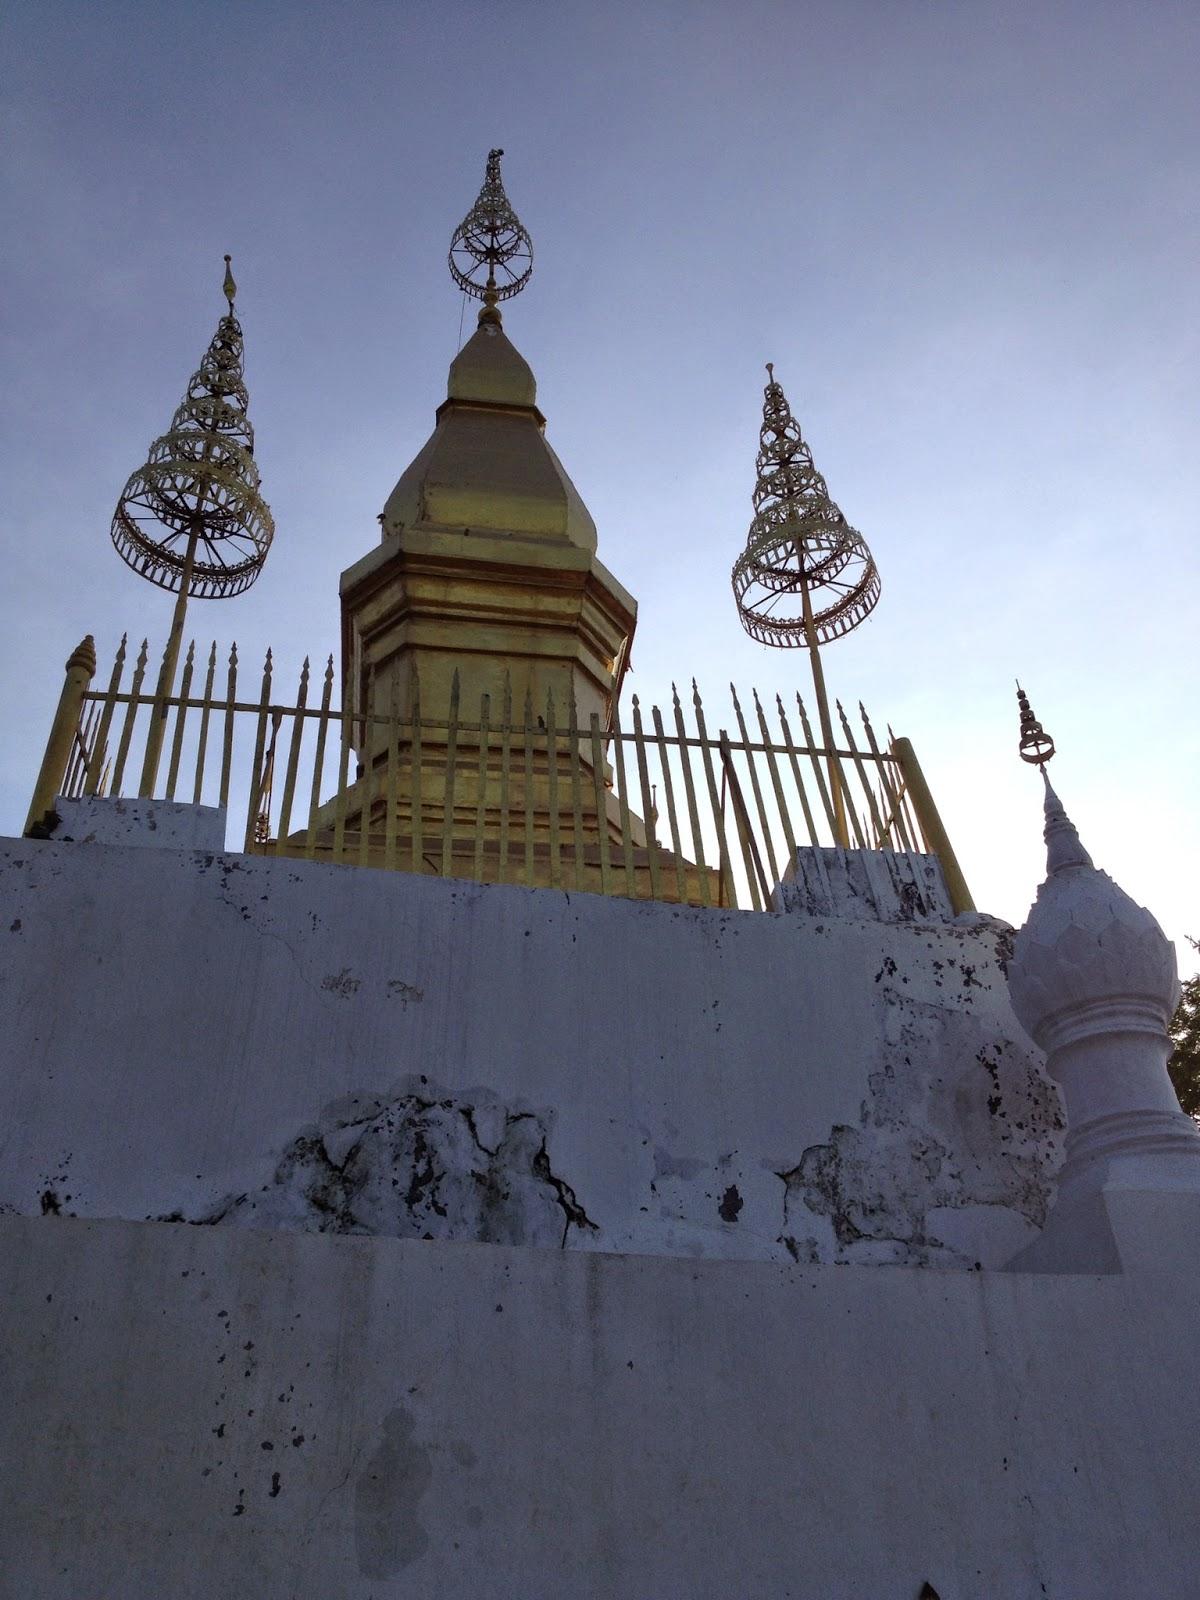 Luang Prabang - That Chomsi pagoda on Phousi Hill